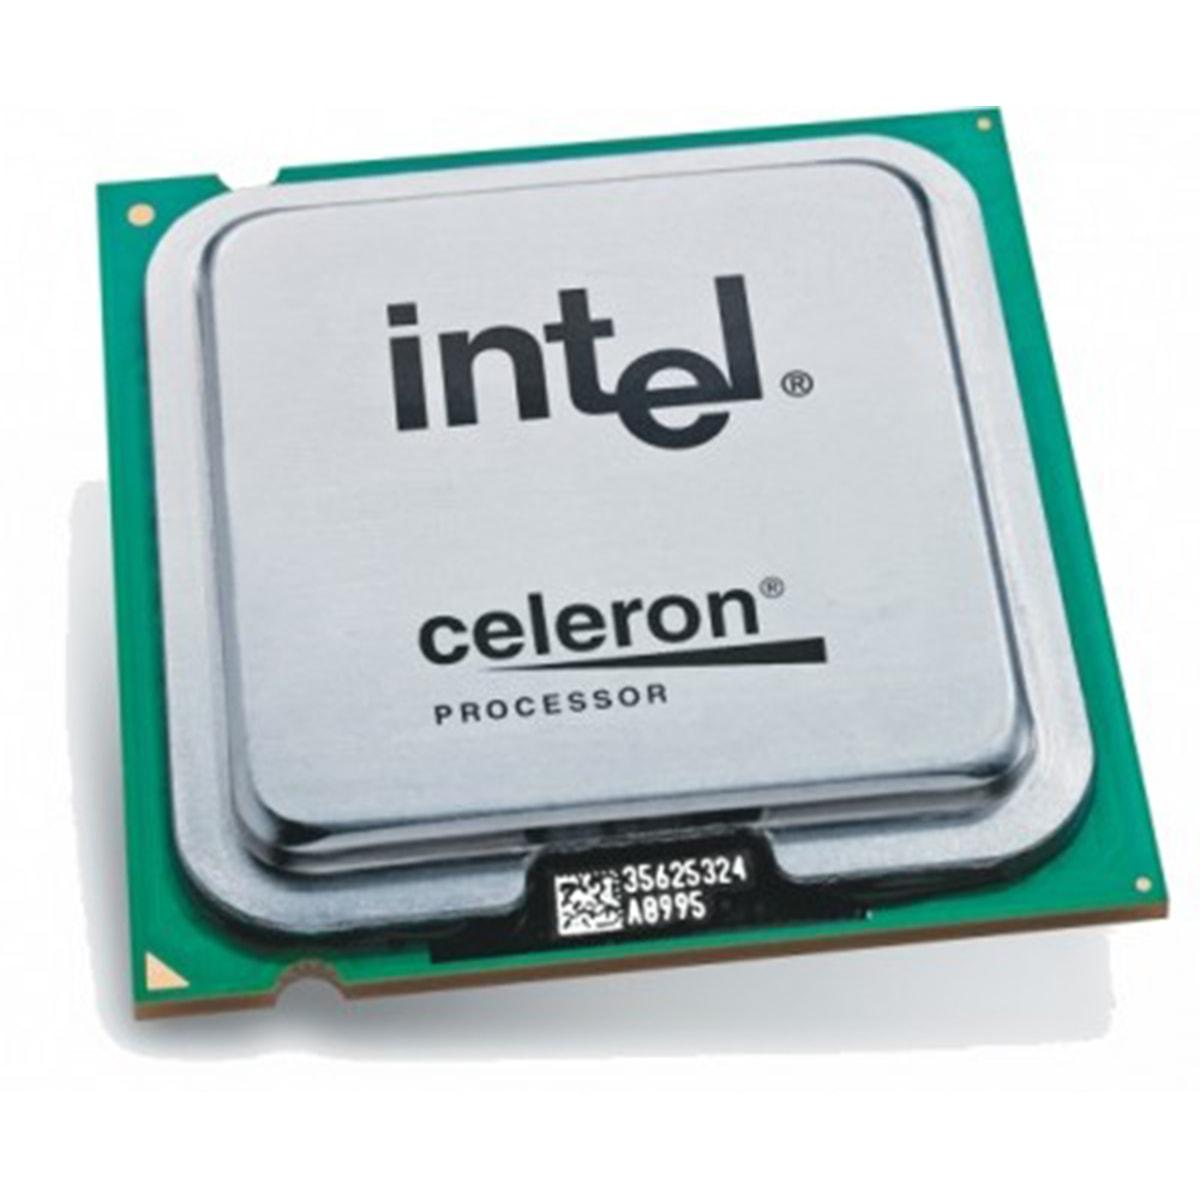 Processador Intel Celeron D 346 3,06 Ghz 256Kb Cache 533MHz - Socket 775 - Seminovo